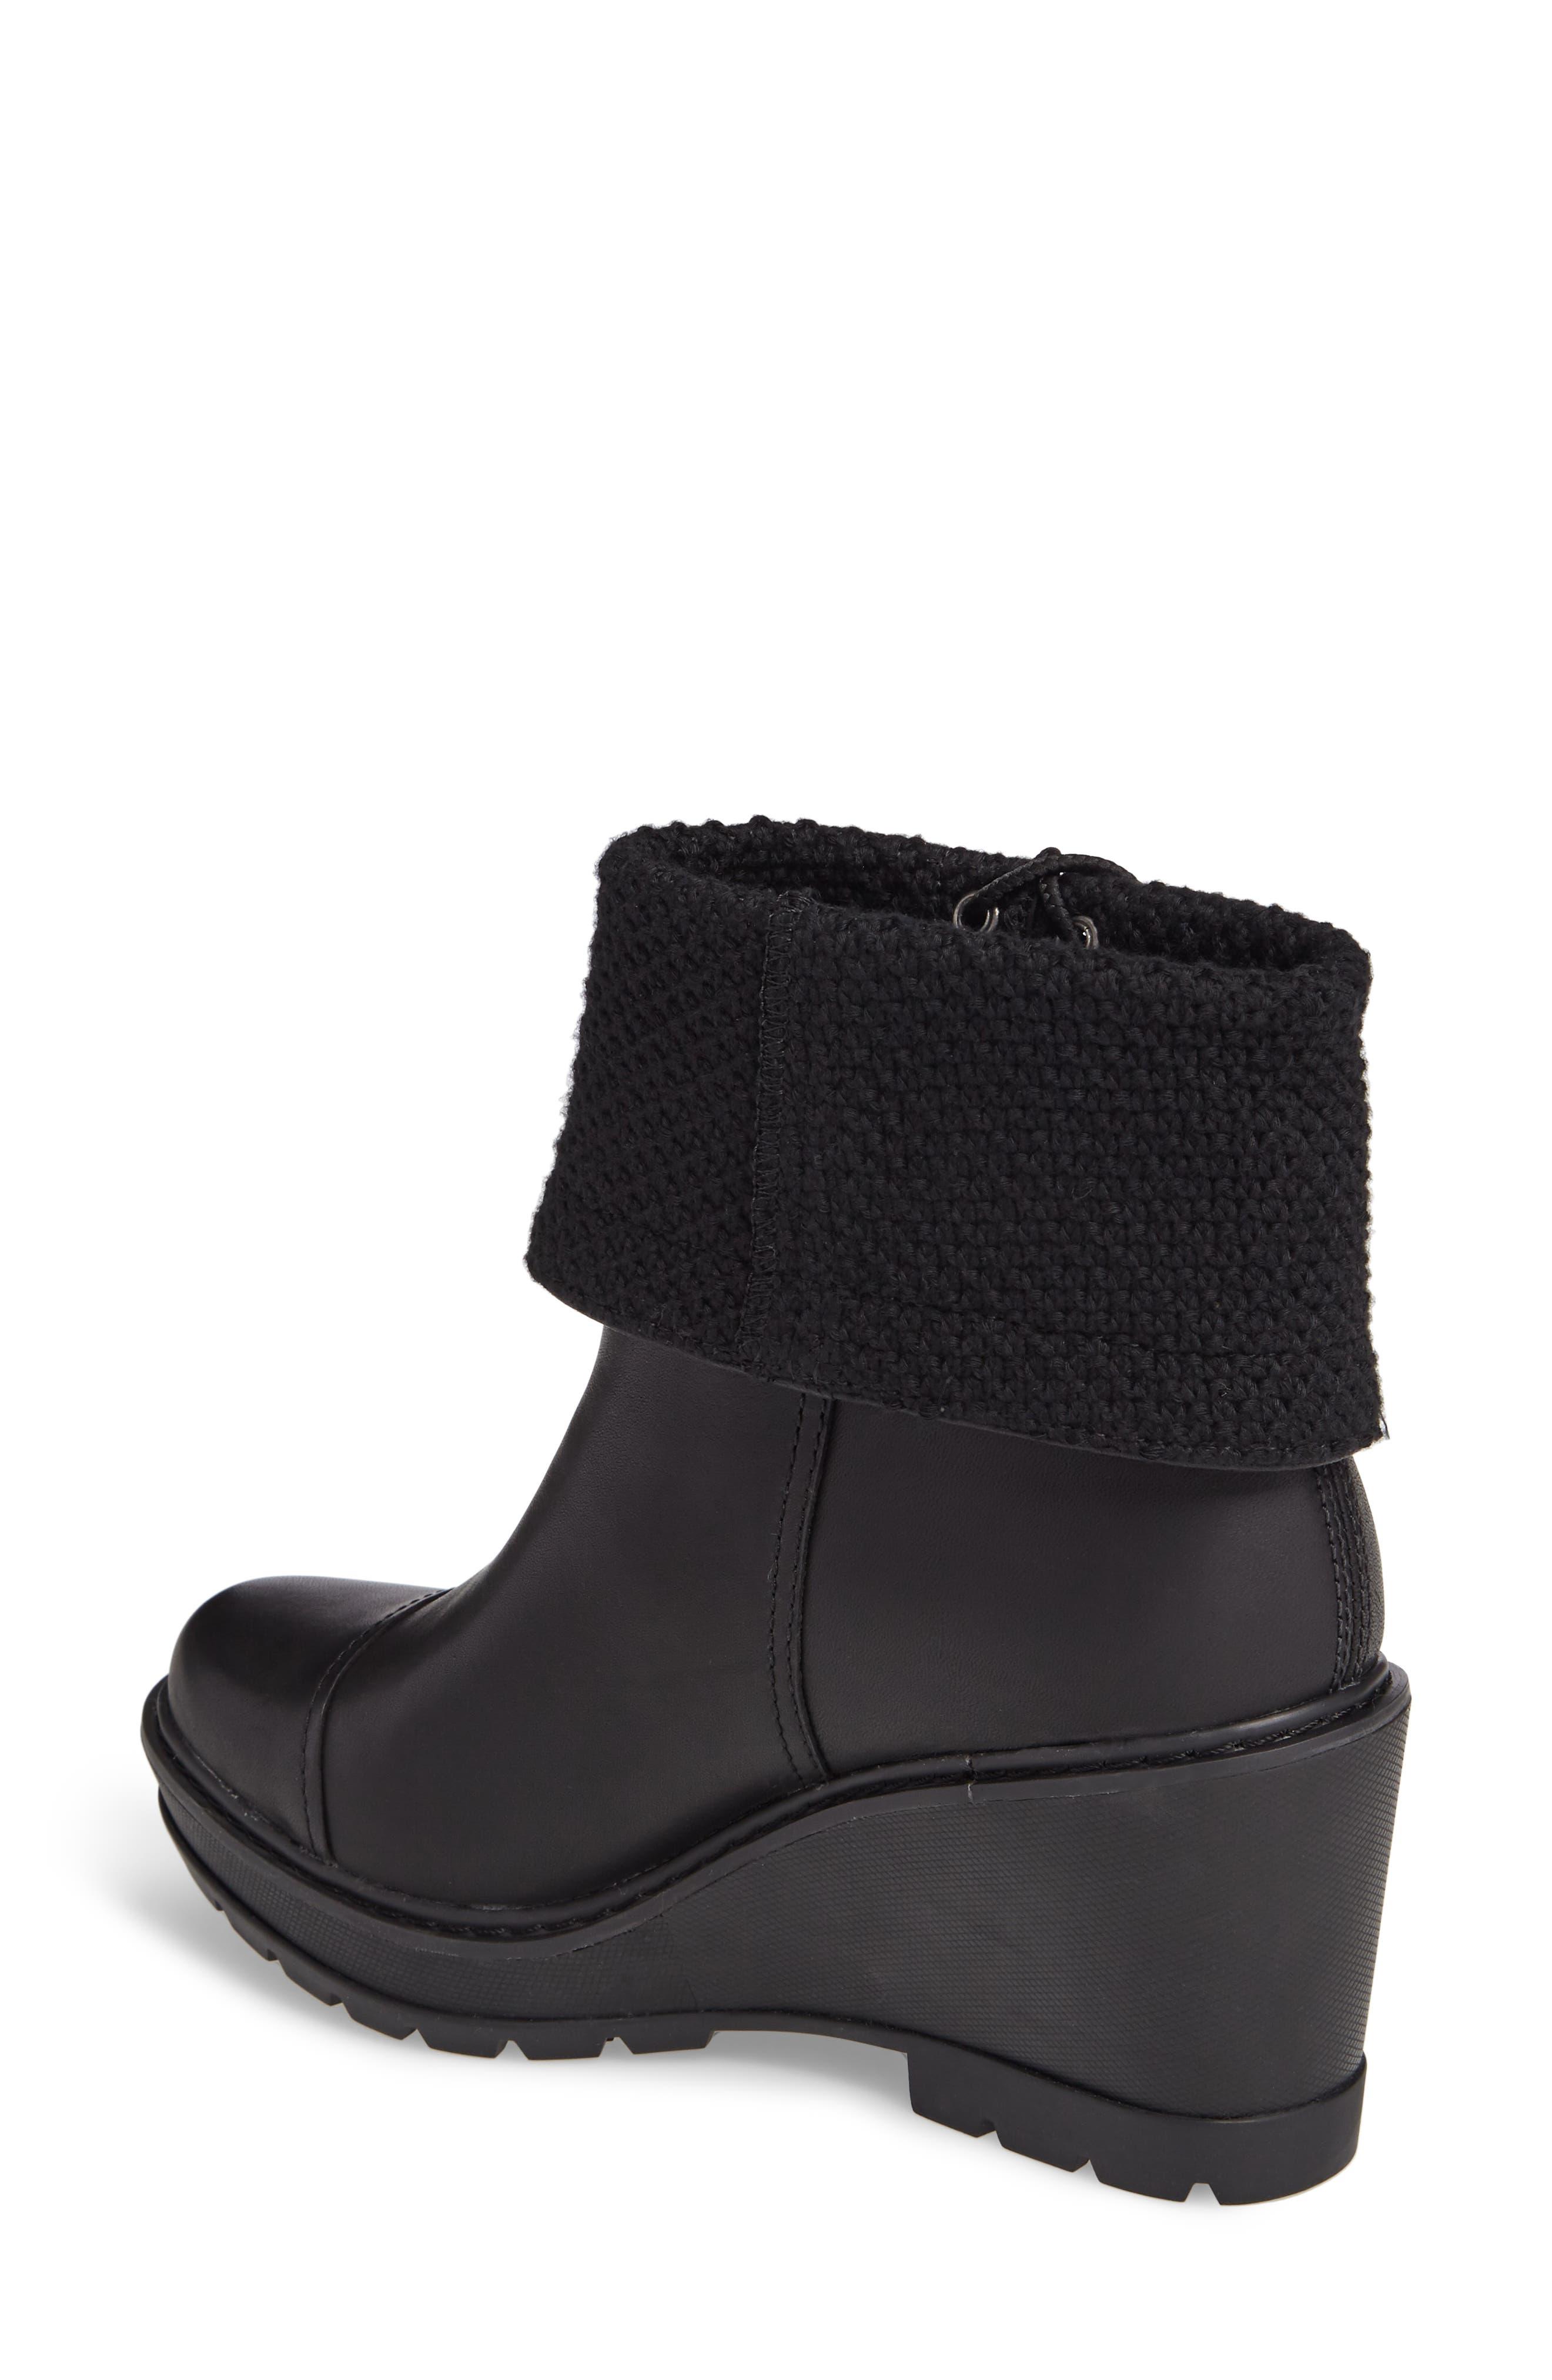 Kellis Fold Down Water Resistant Boot,                             Alternate thumbnail 2, color,                             001